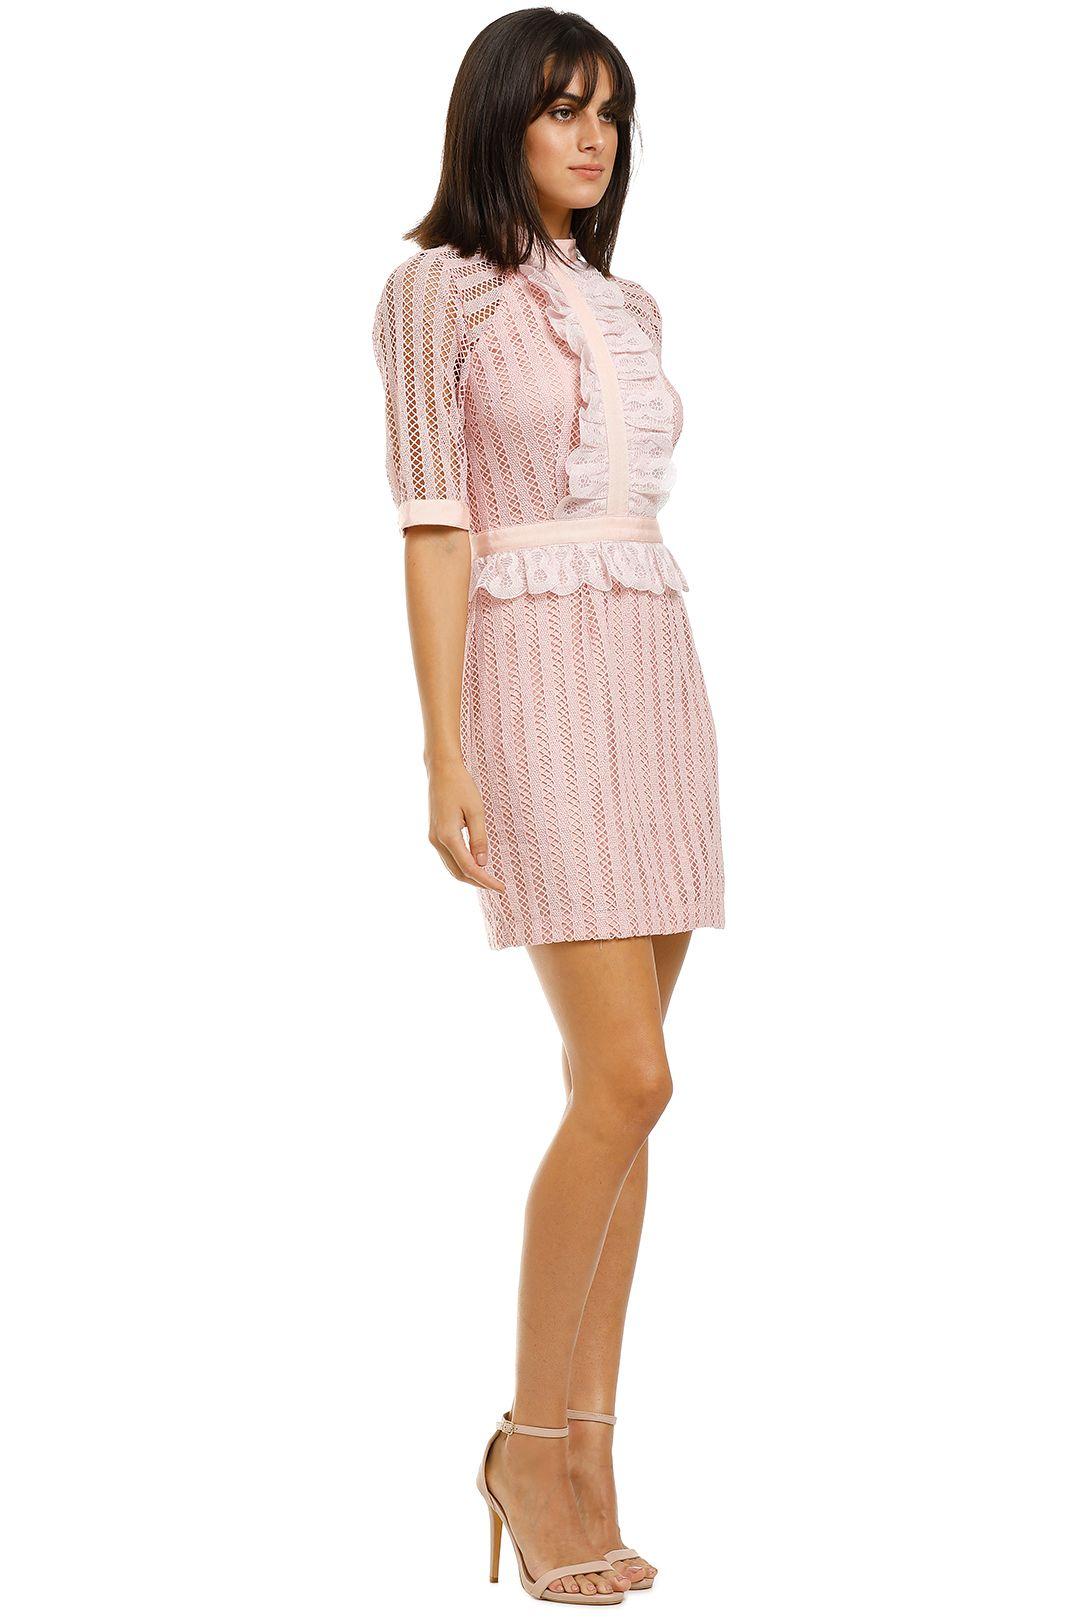 Keepsake-the-Label-Portrait-Mini-Dress-Blush-Side